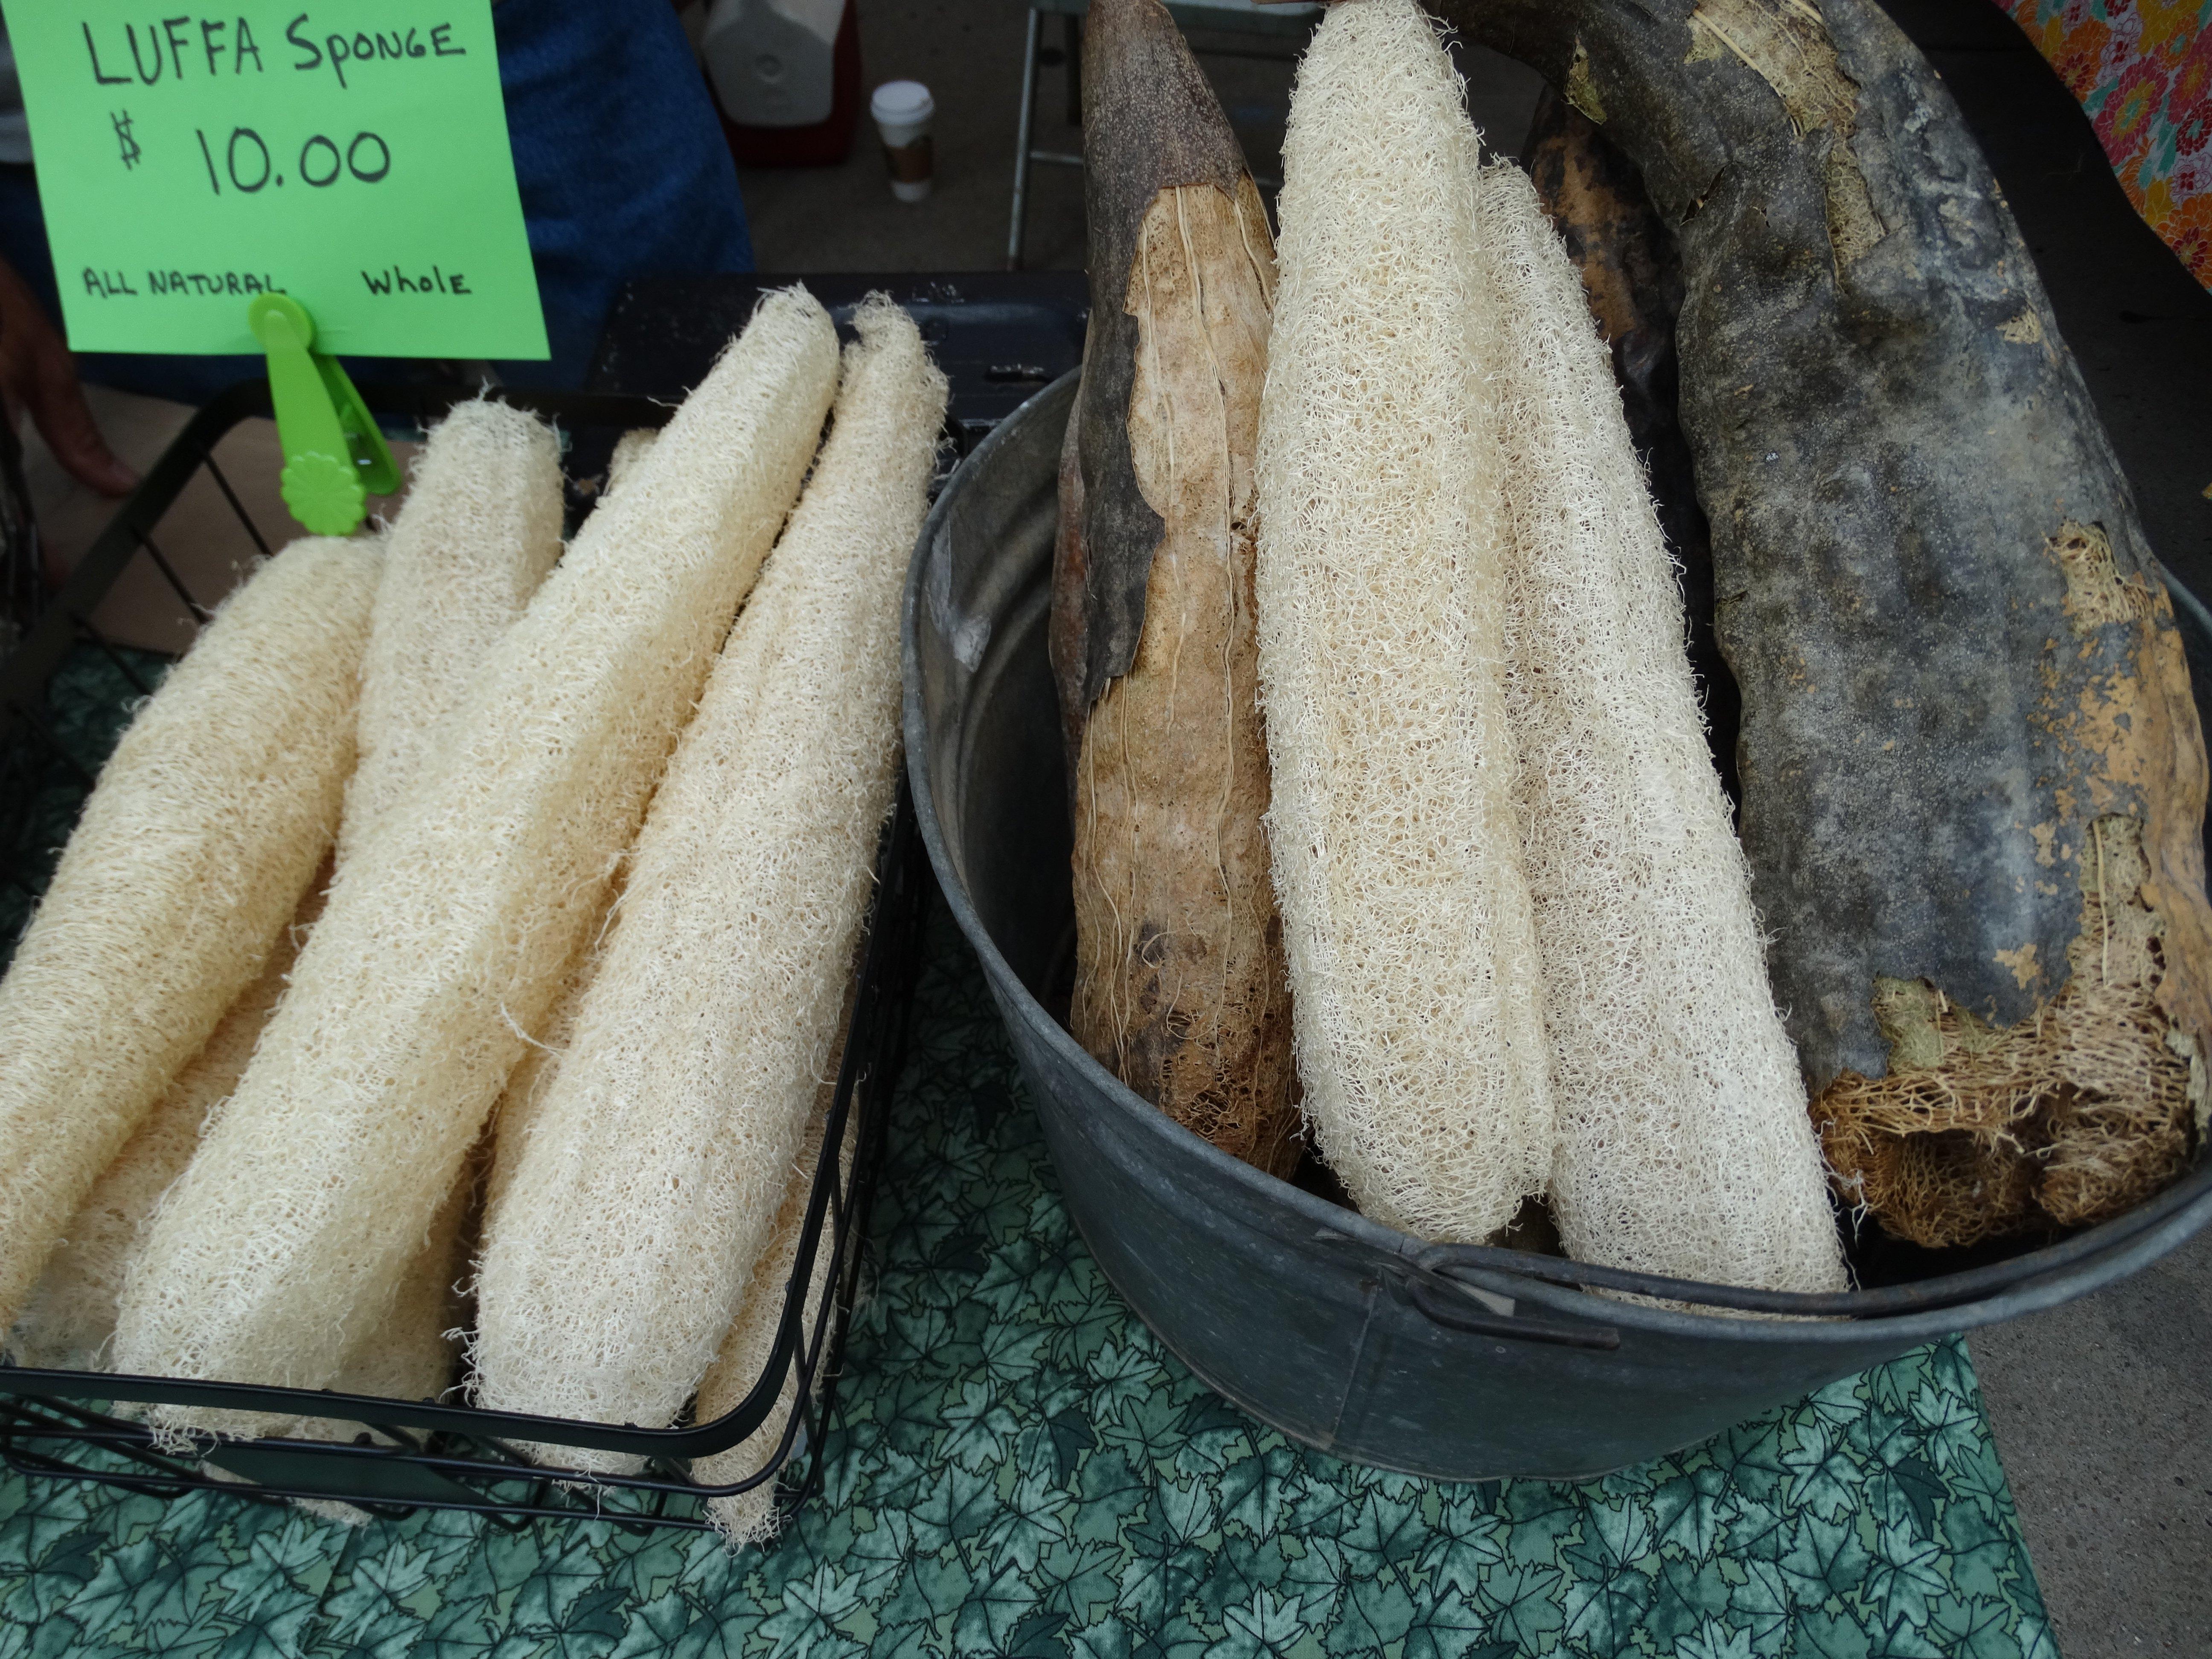 luffa sponge at farmers market